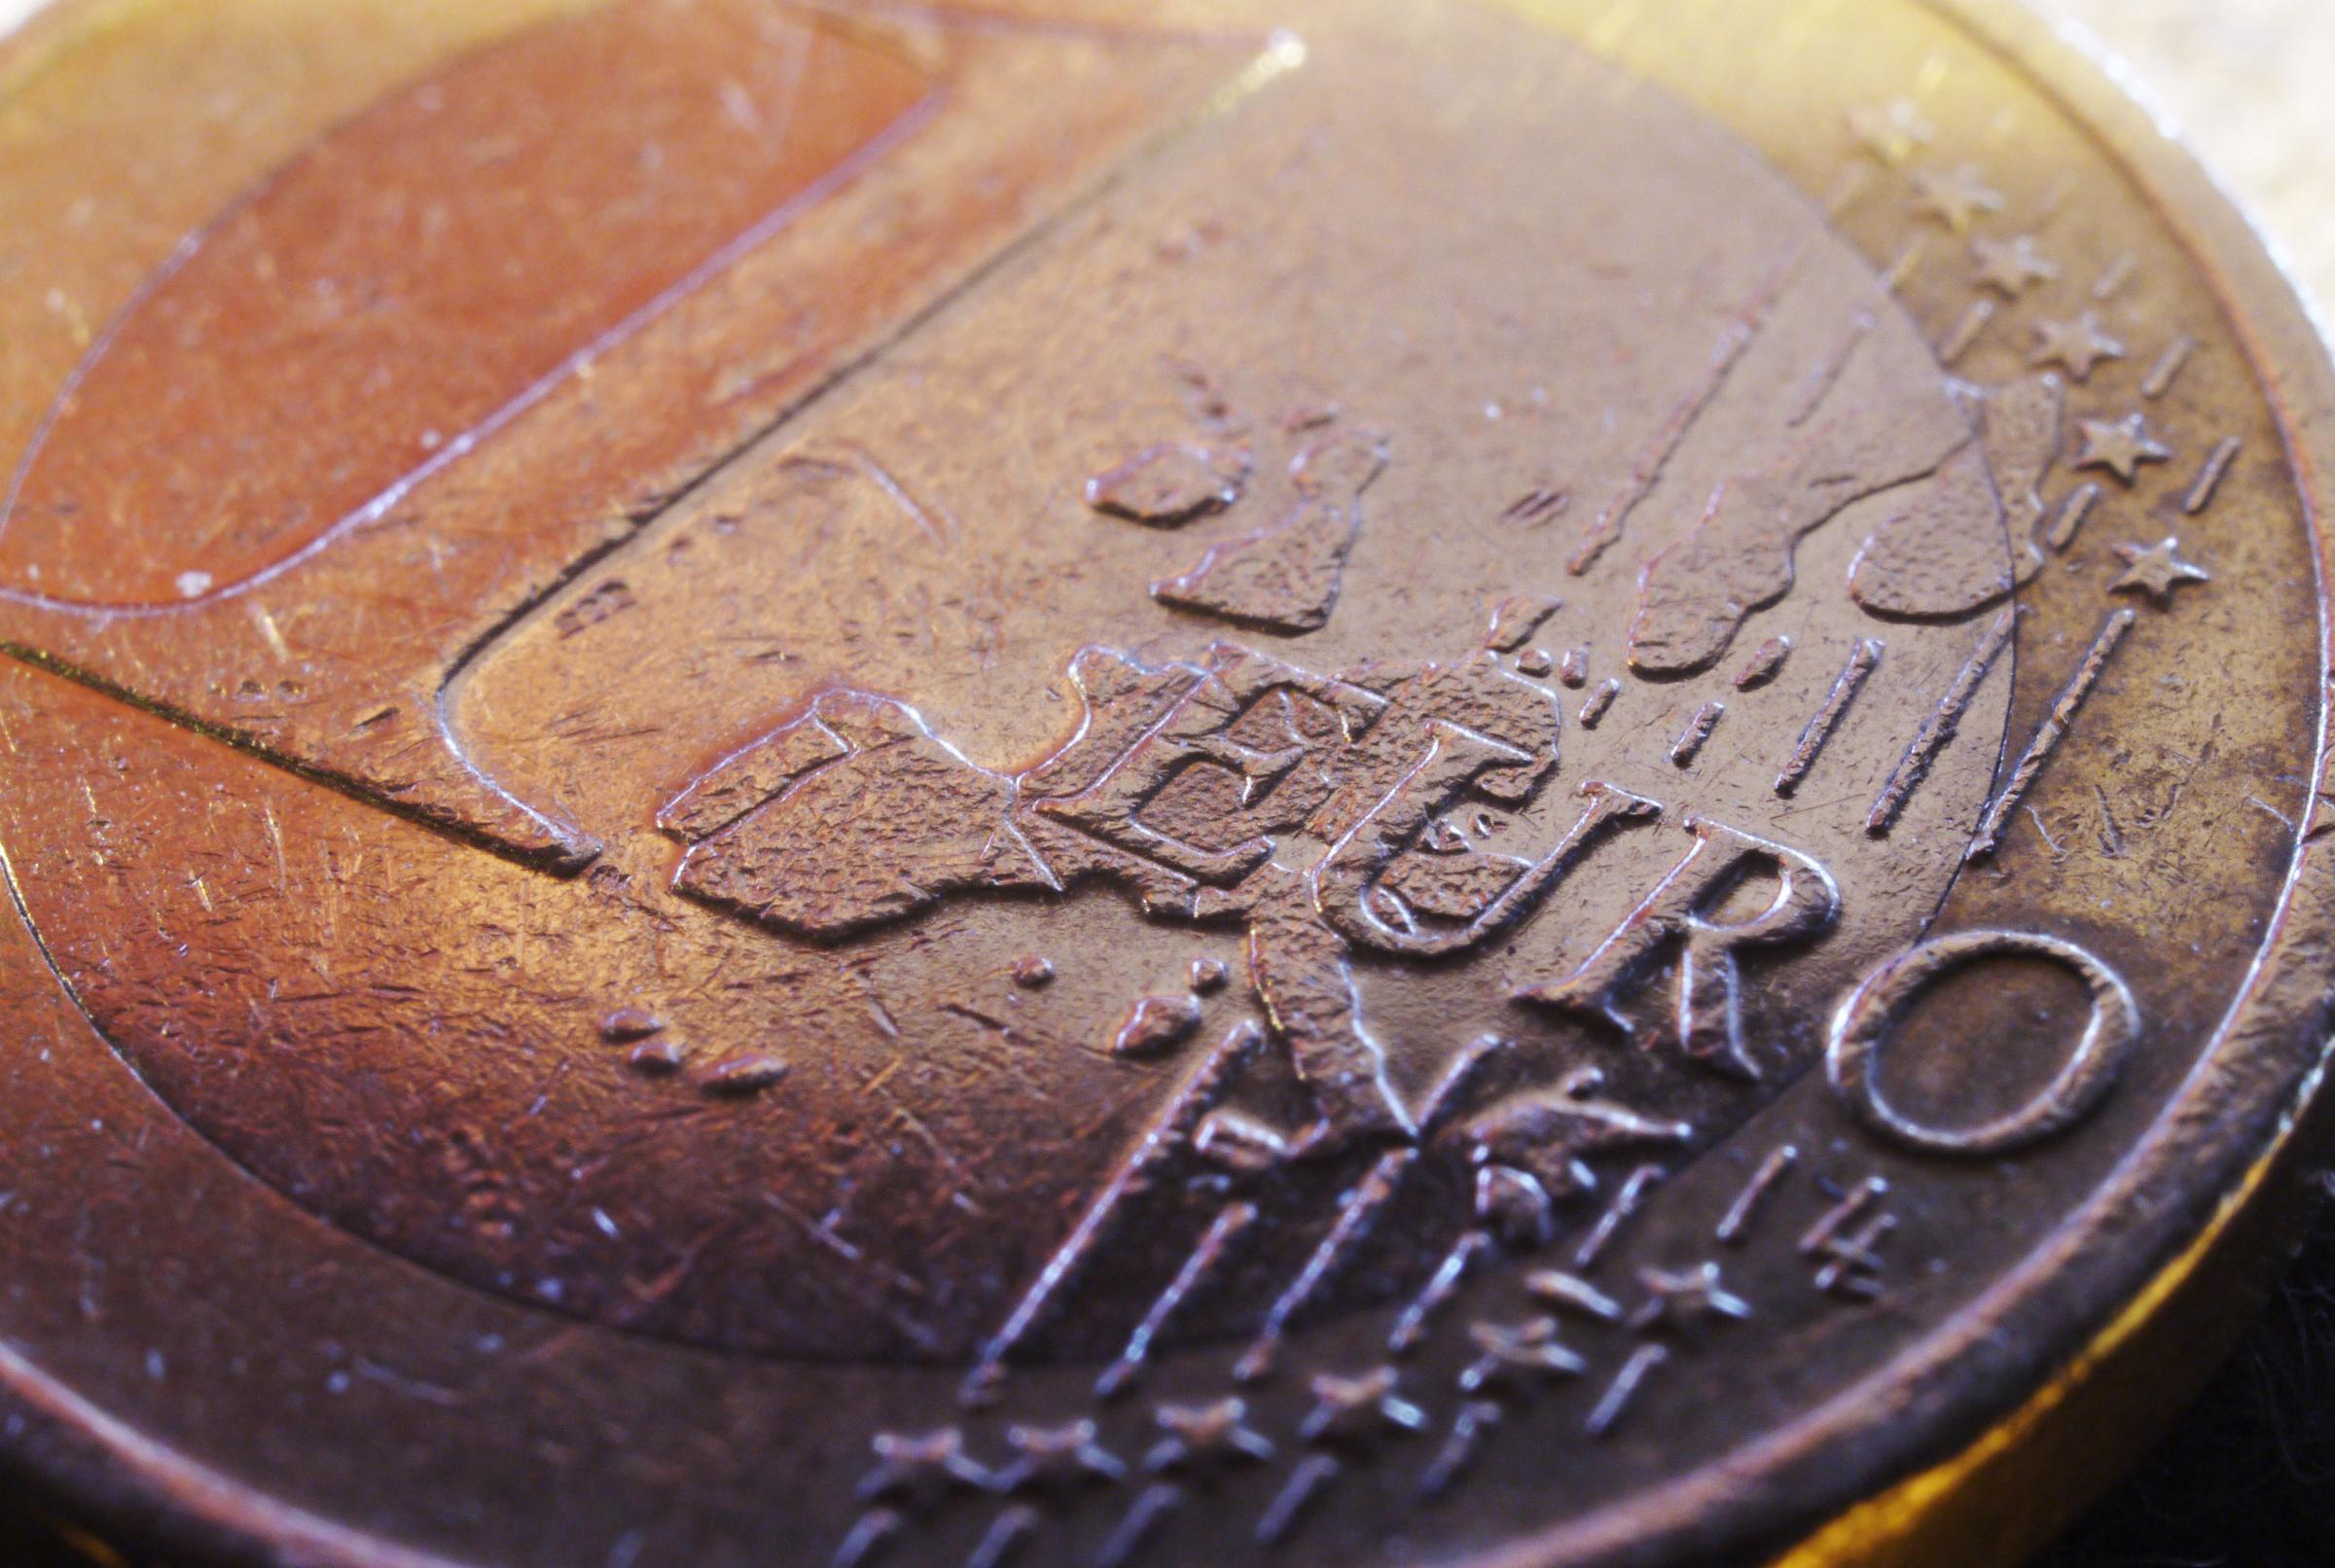 http://www.ilgiornale.it/sites/default/files/foto/2014/11/17/1416216818-euro-moneta-coin.jpg